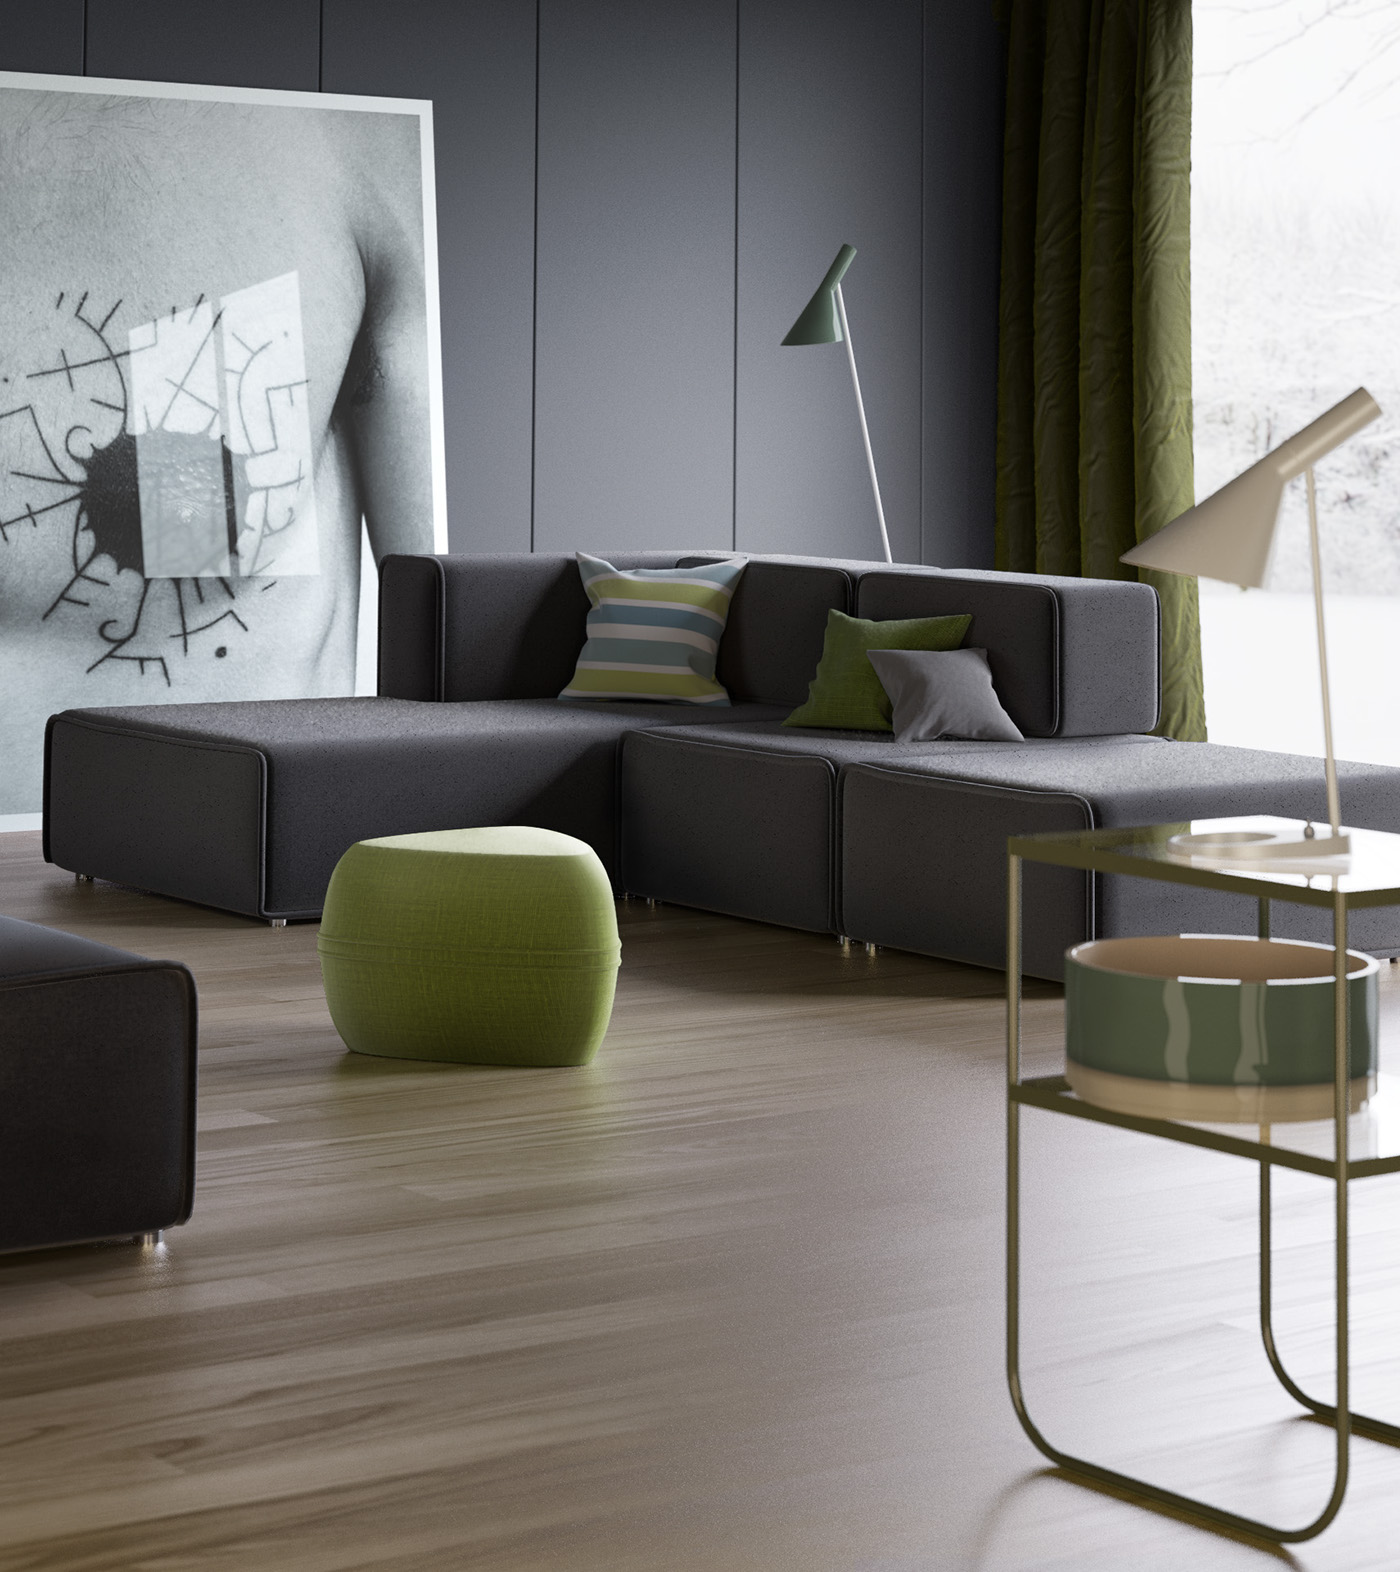 urban sofa gallery mid century modern style sleeper boconcept carmo on behance